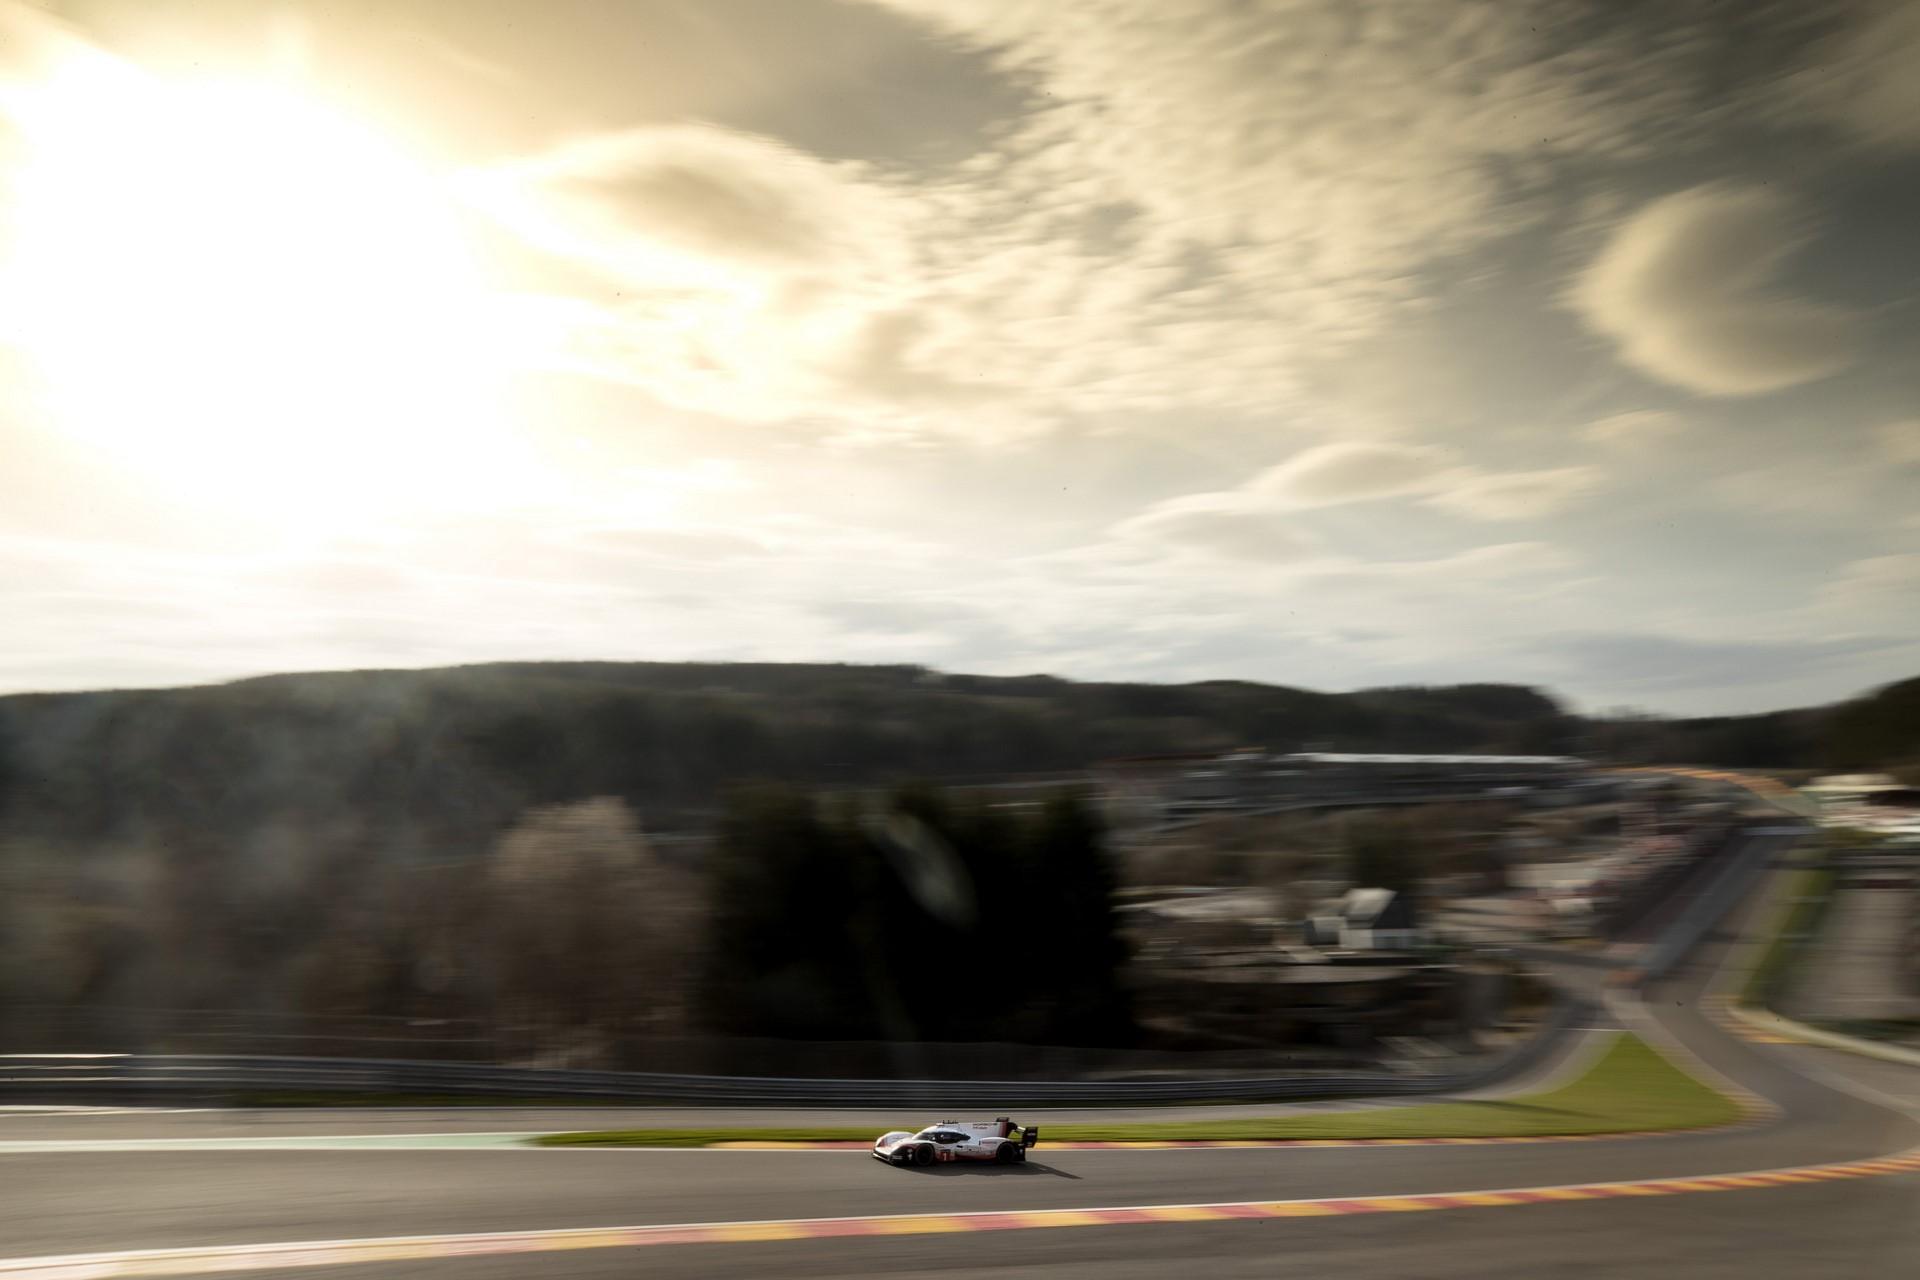 Porsche 919 Hybrid Evo Spa Record (39)